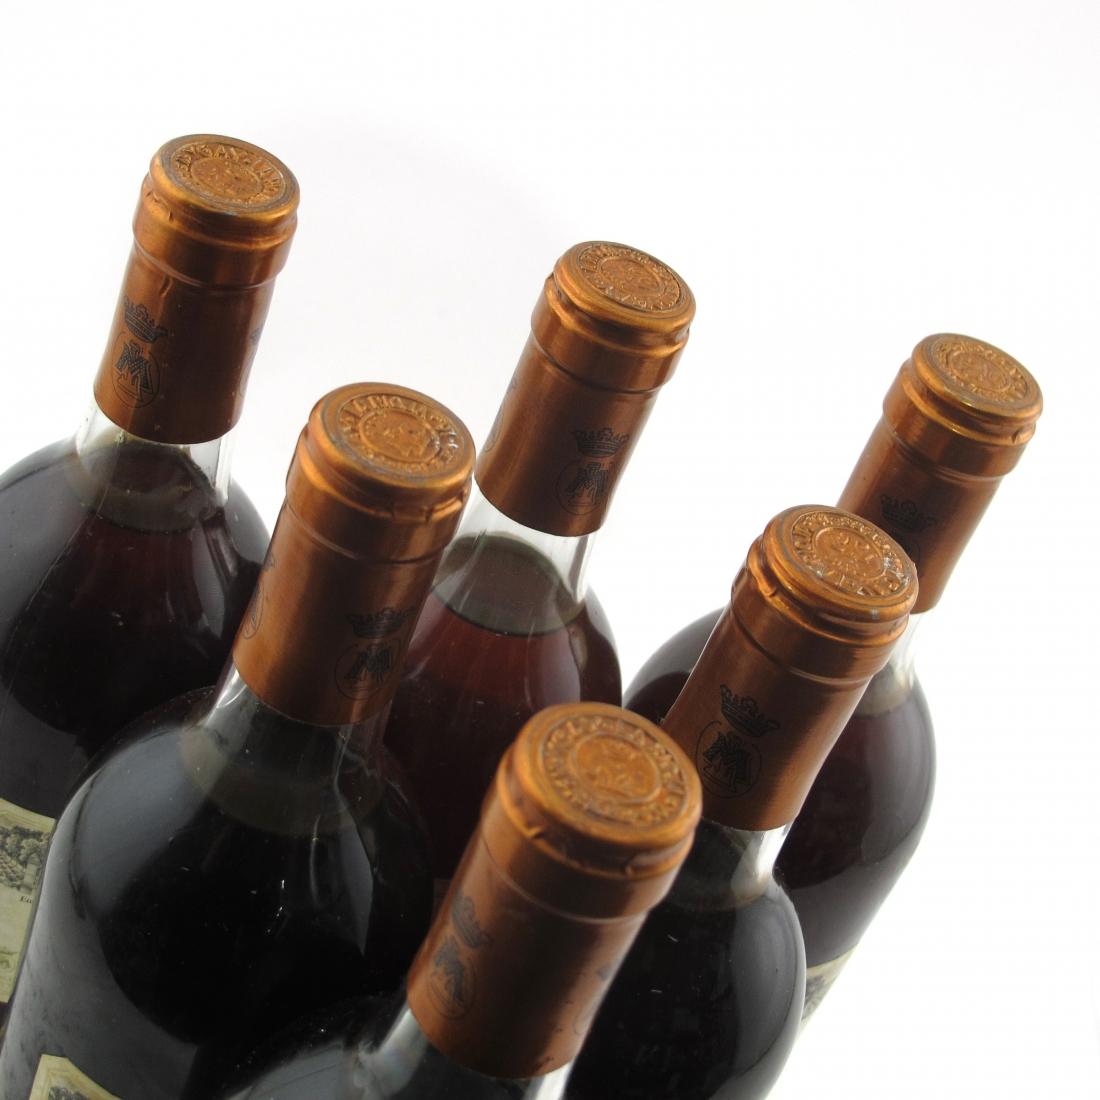 Marques De Murrieta 1986 Rioja Blanco Reserva 6x75cl